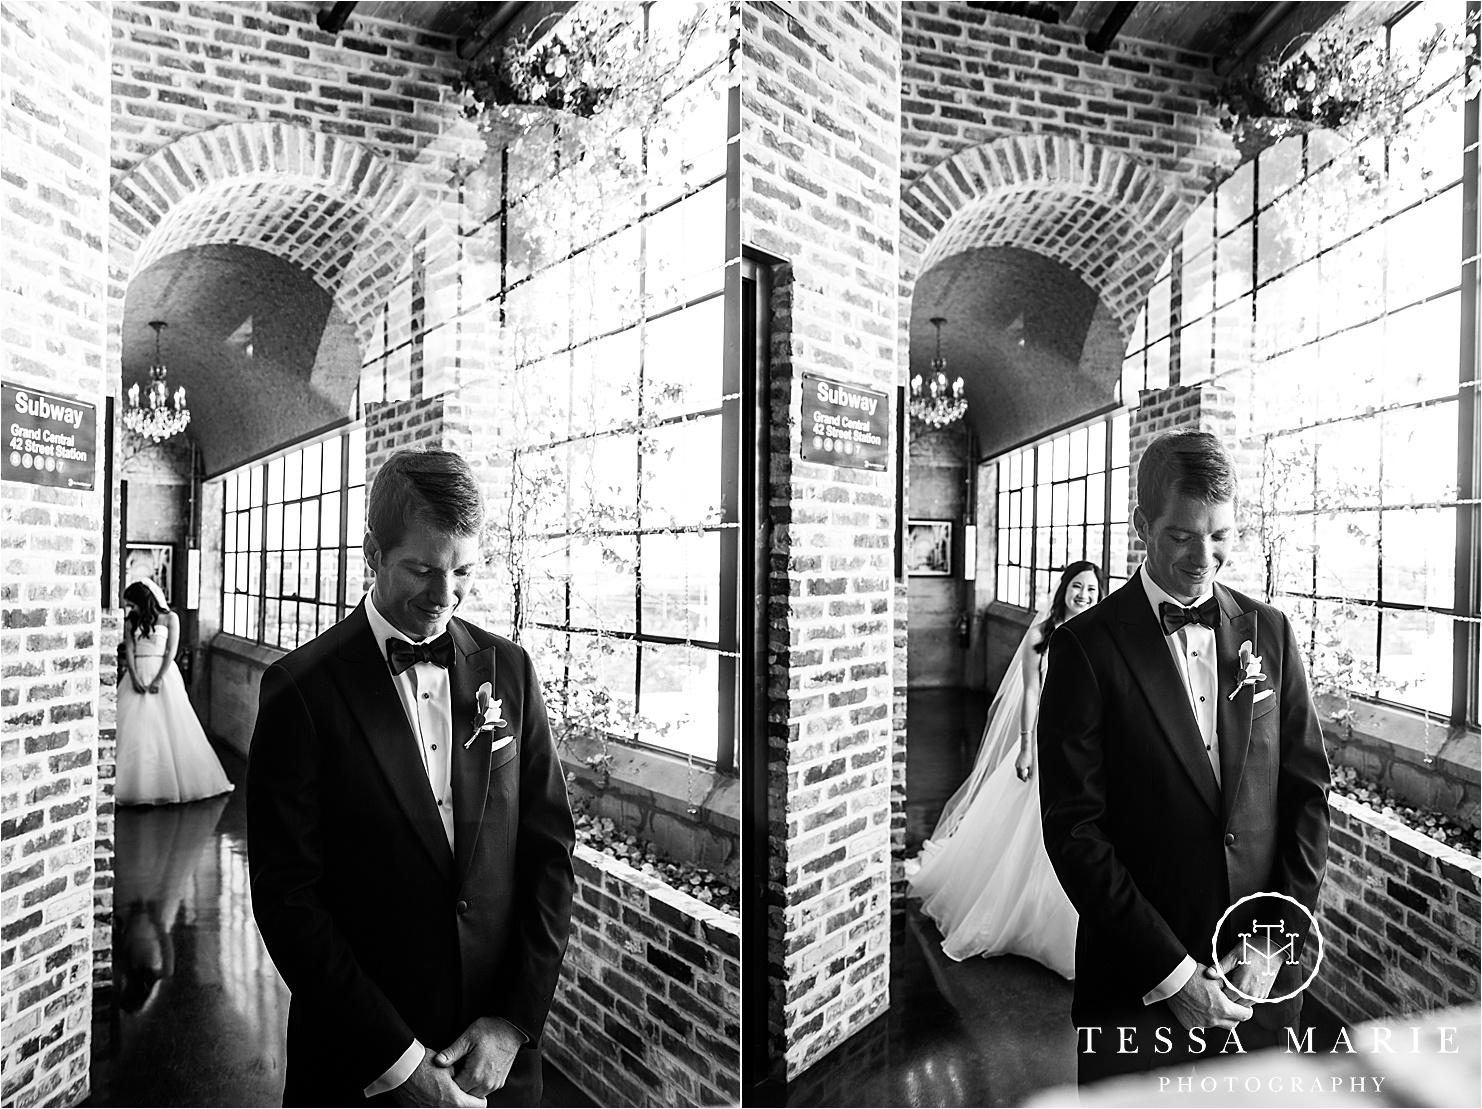 Tessa_marie_weddings_houston_wedding_photographer_The_astorian_0048.jpg